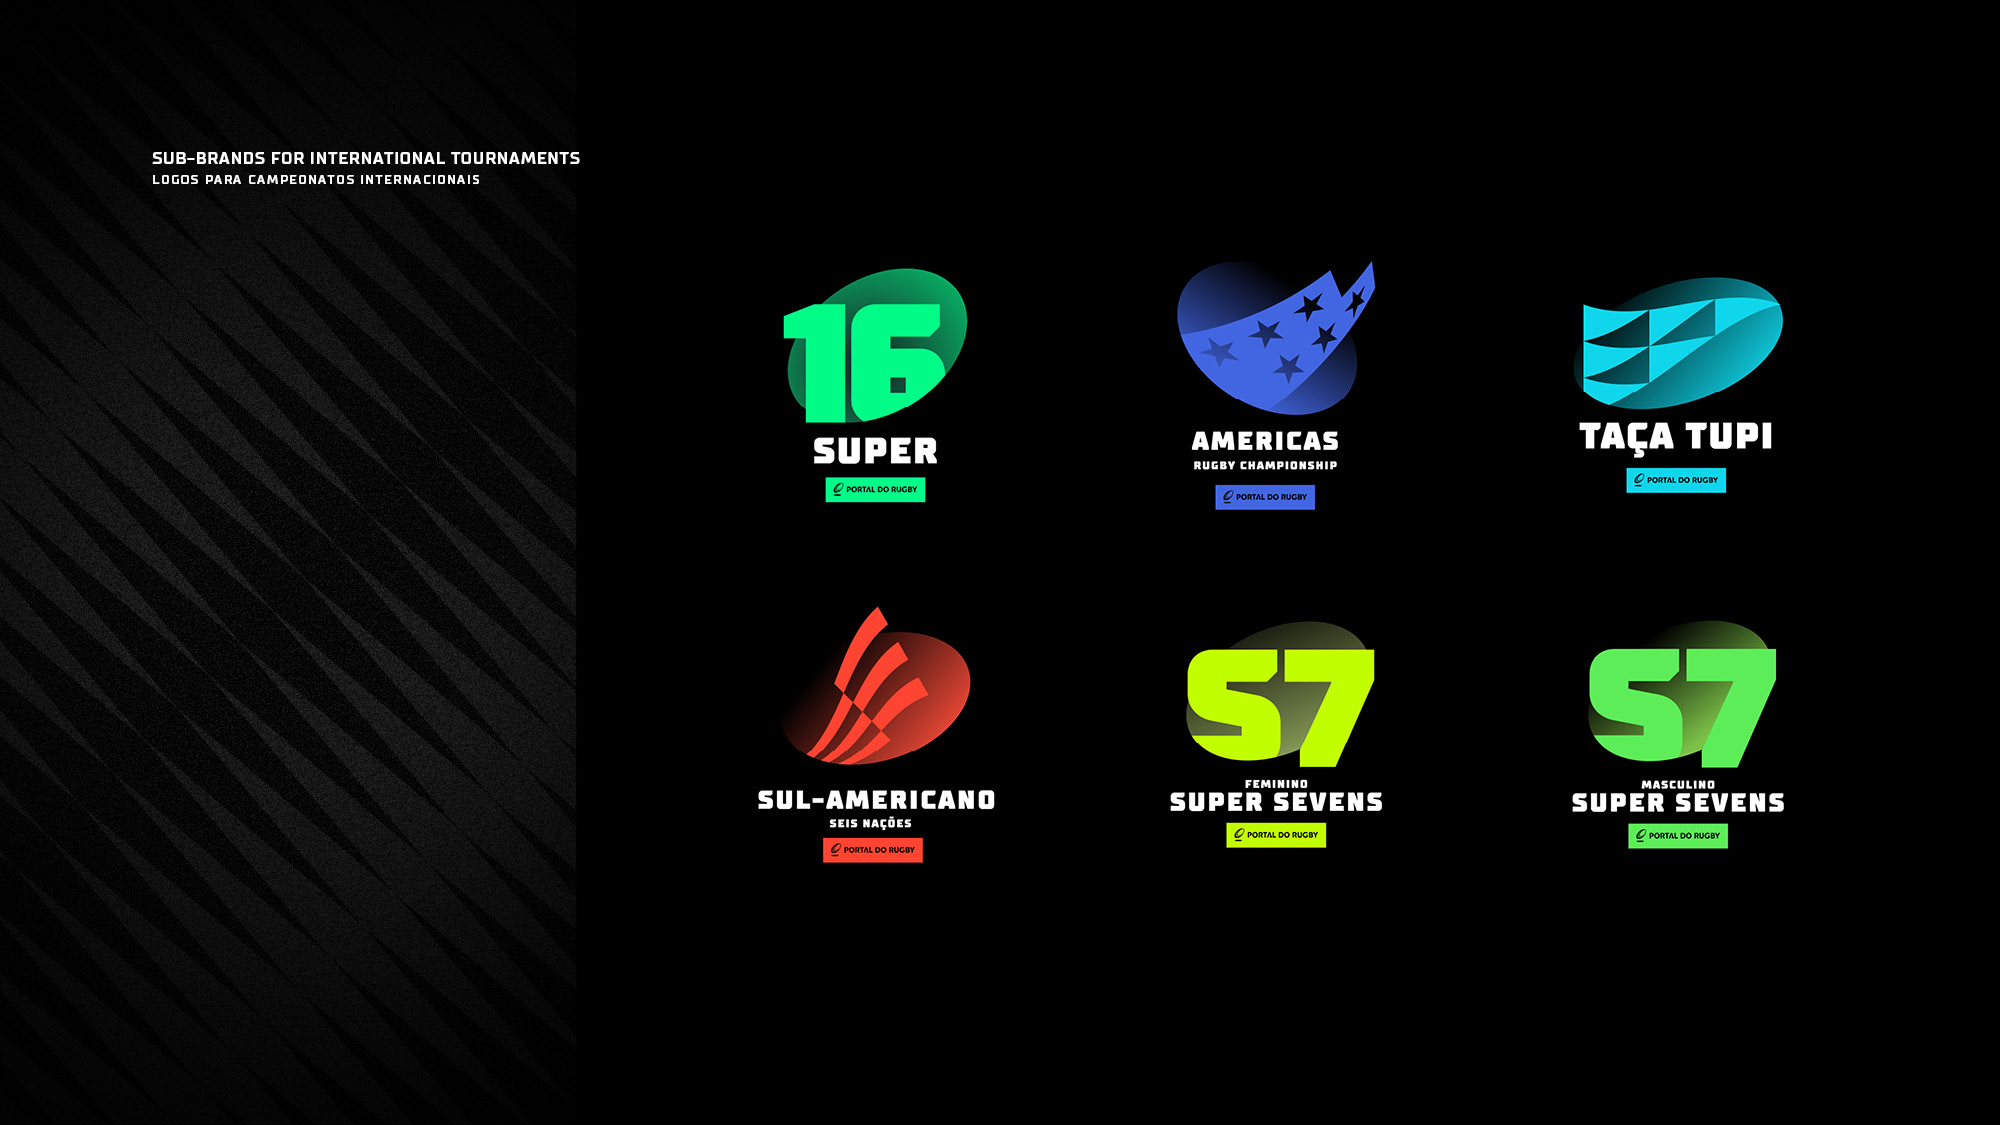 Nacione-Branding-Portal-do-Rugby19